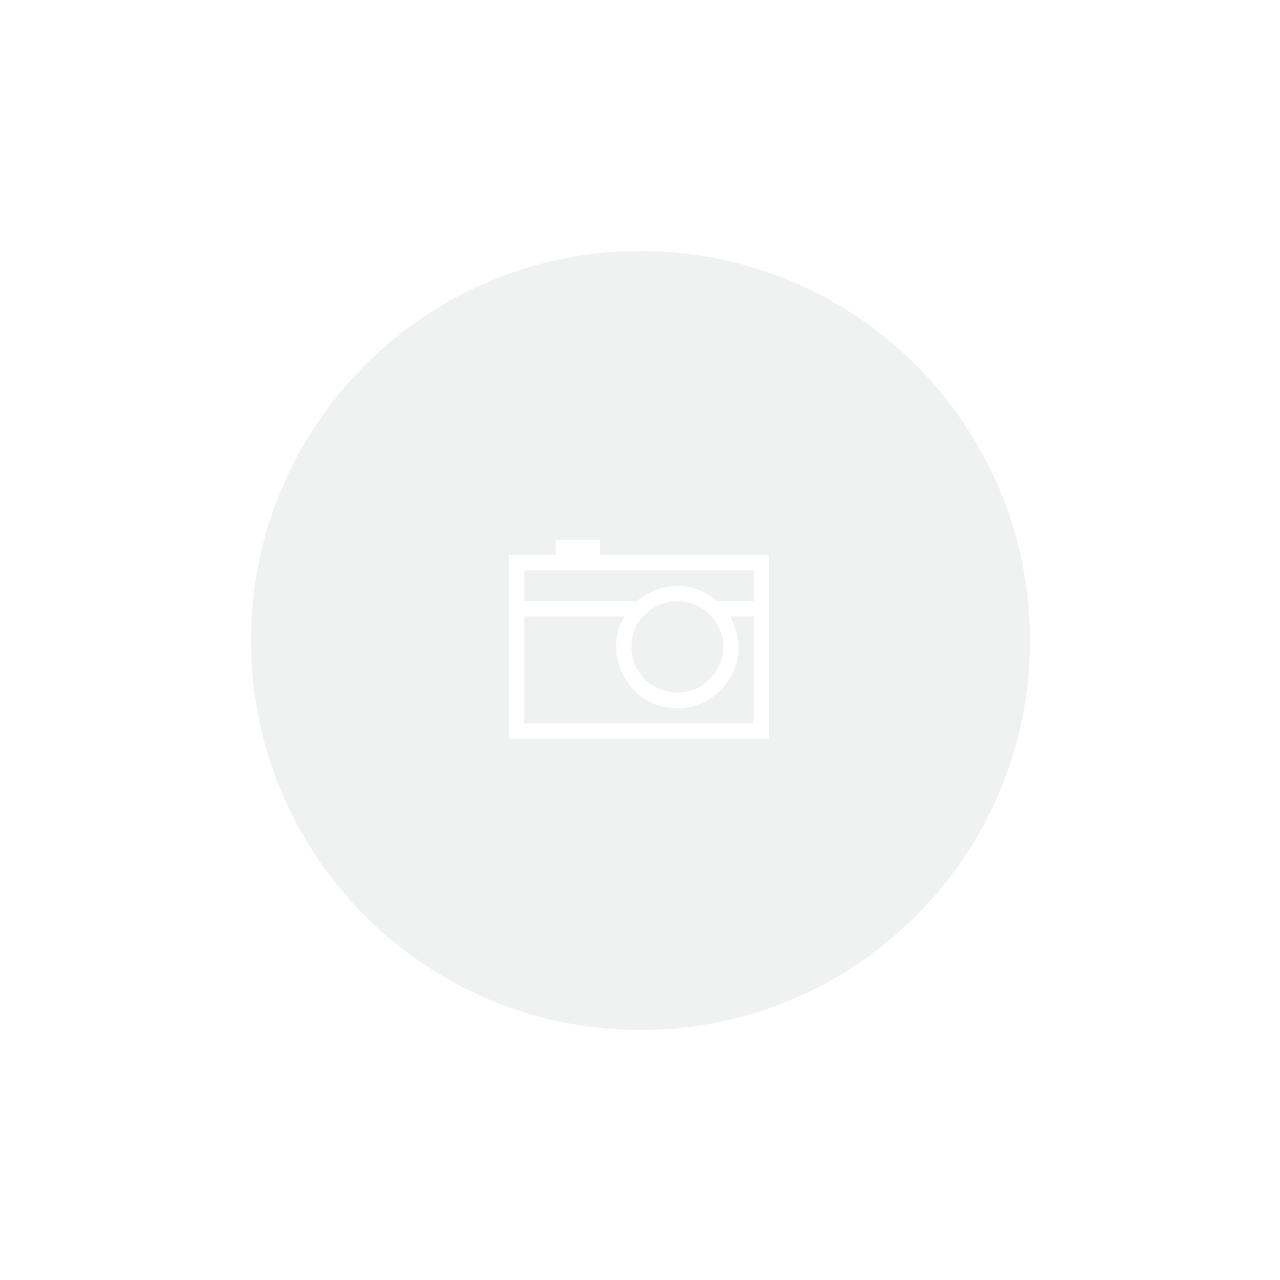 PLACA DE VÍDEO SAPPHIRE PULSE RADEON RX 580 8GB GDDR5 256 BITS, 11265-05-20G